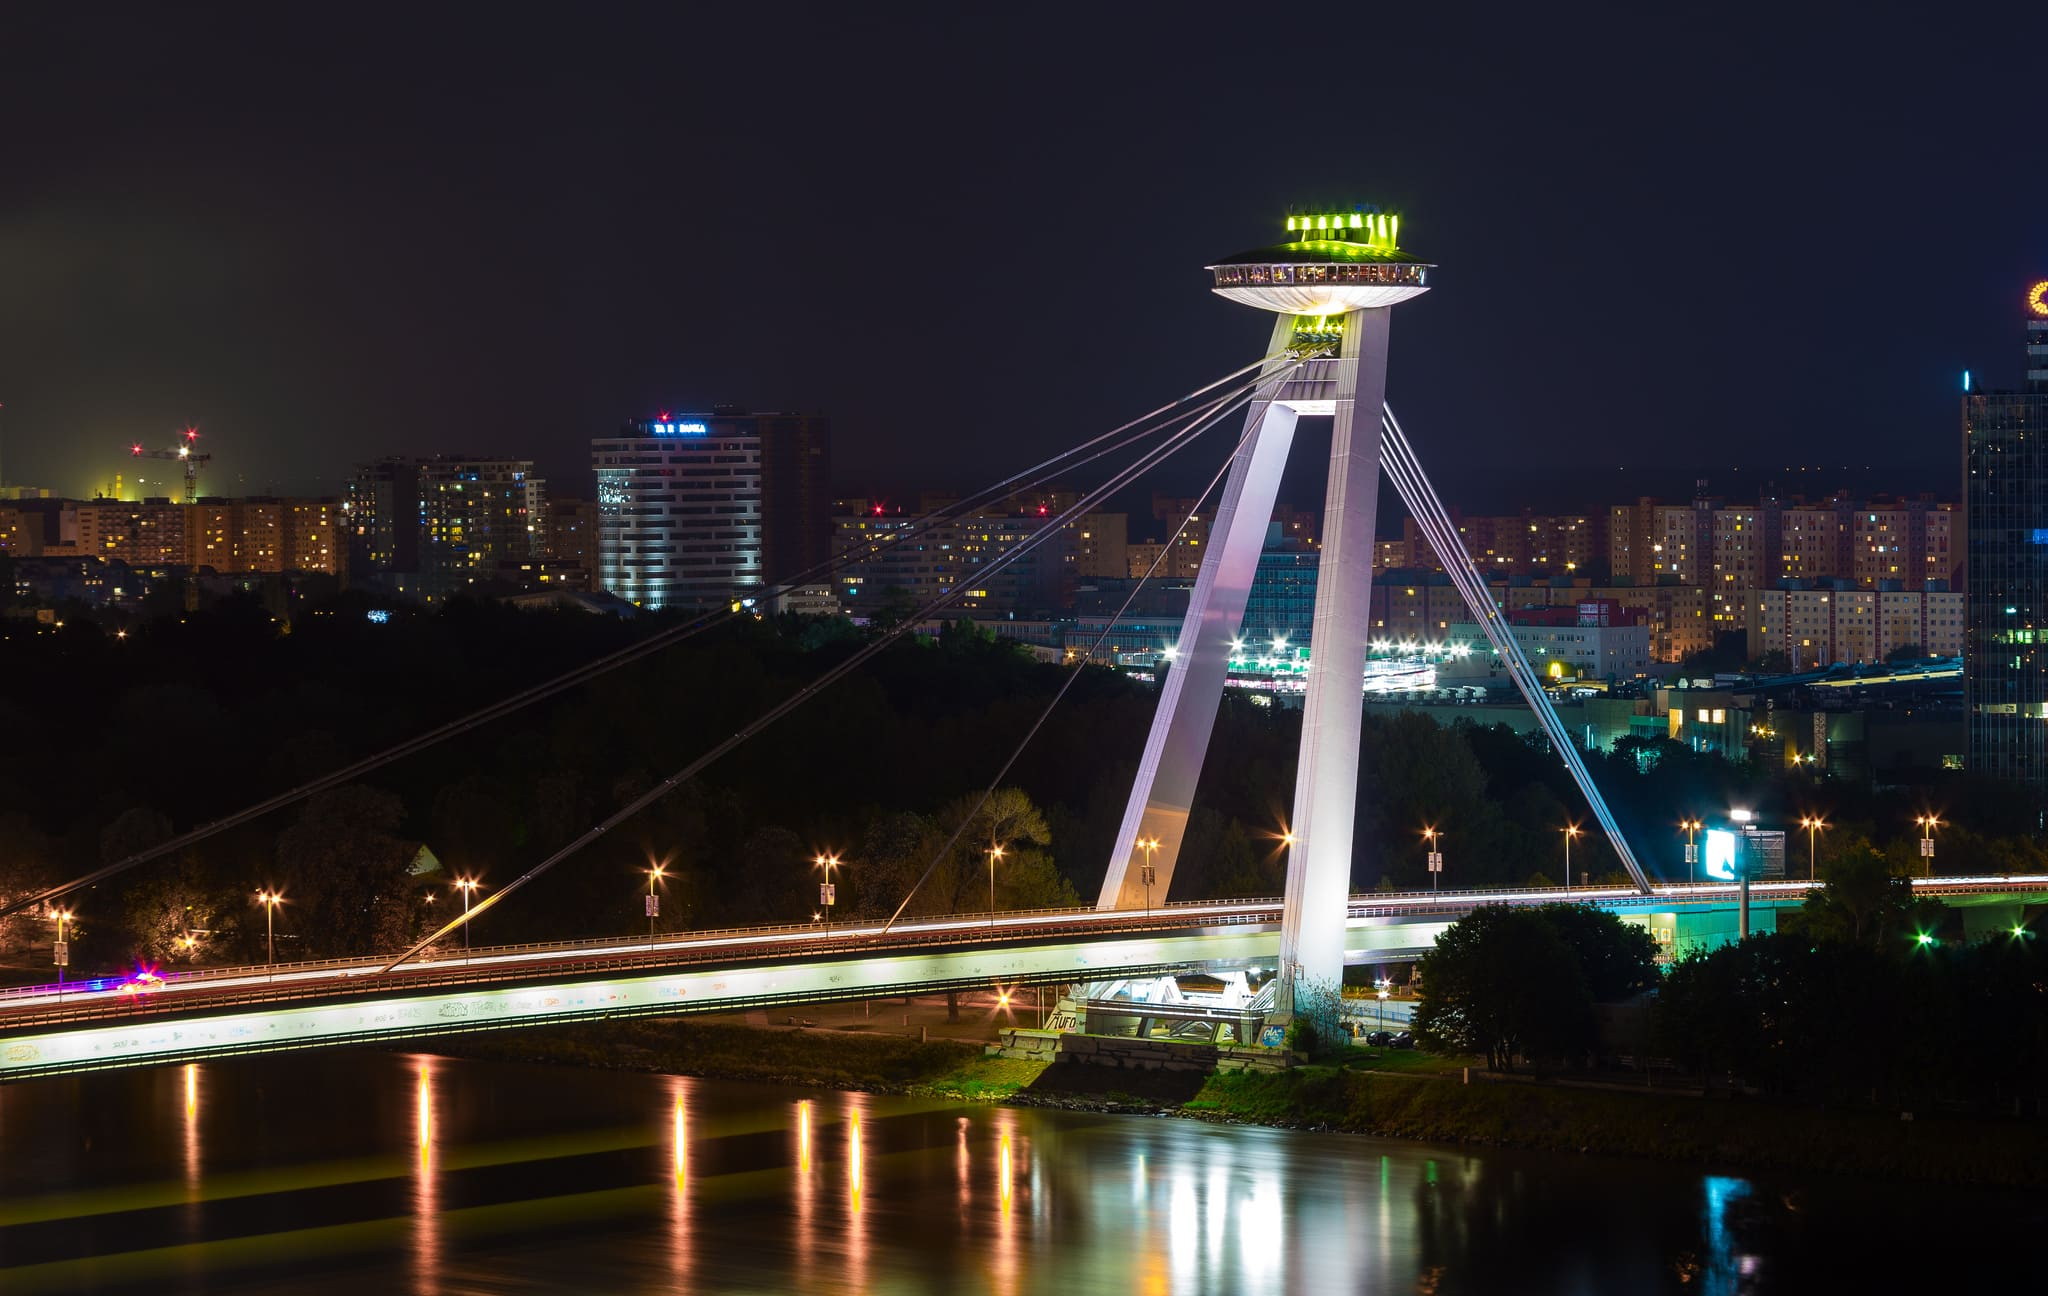 Notte a Bratislava